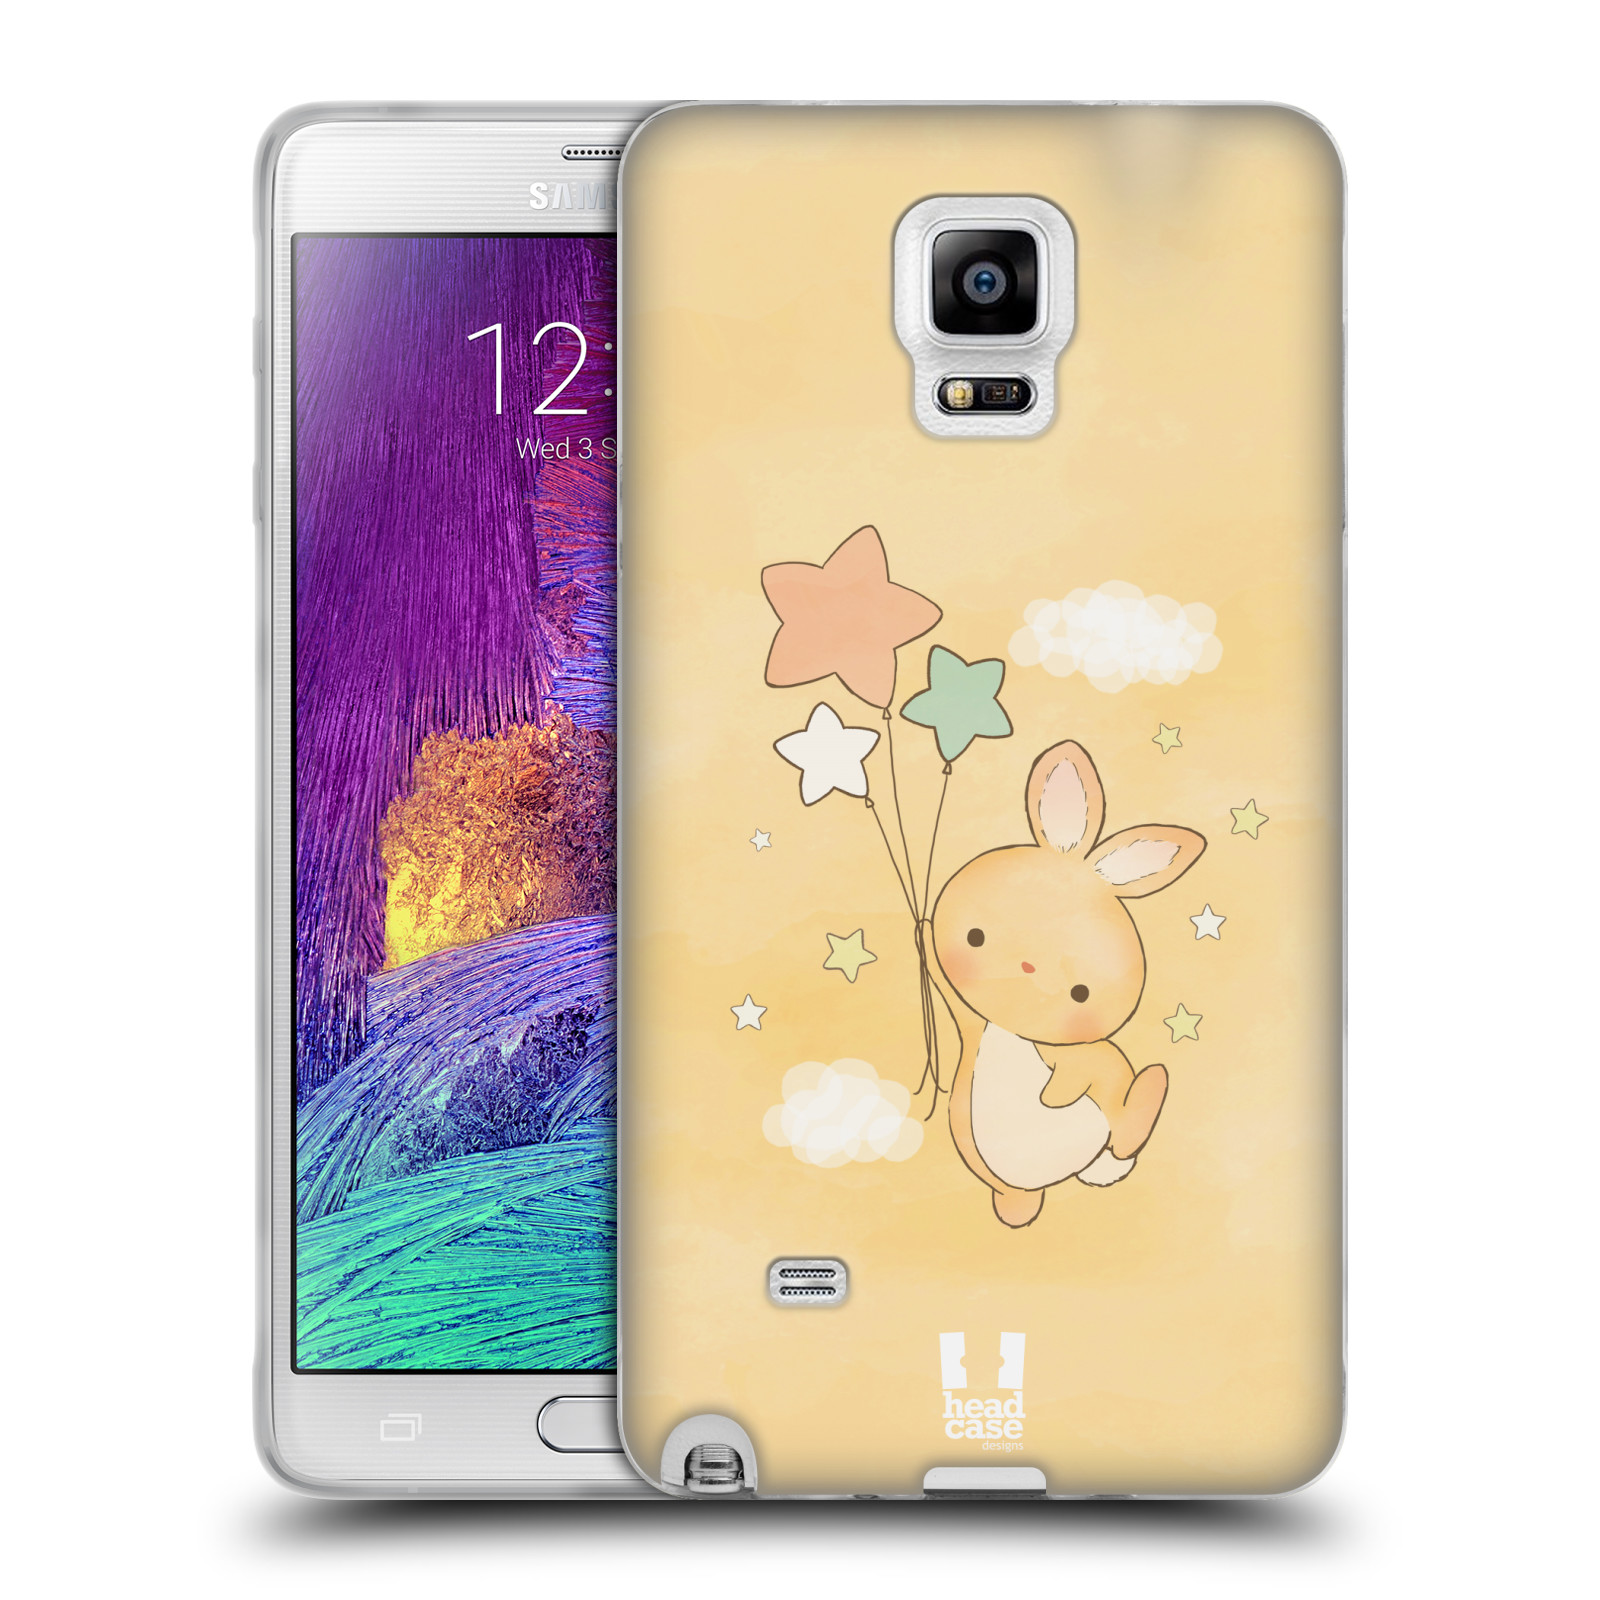 HEAD CASE silikonový obal na mobil Samsung Galaxy Note 4 (N910) vzor králíček a hvězdy žlutá